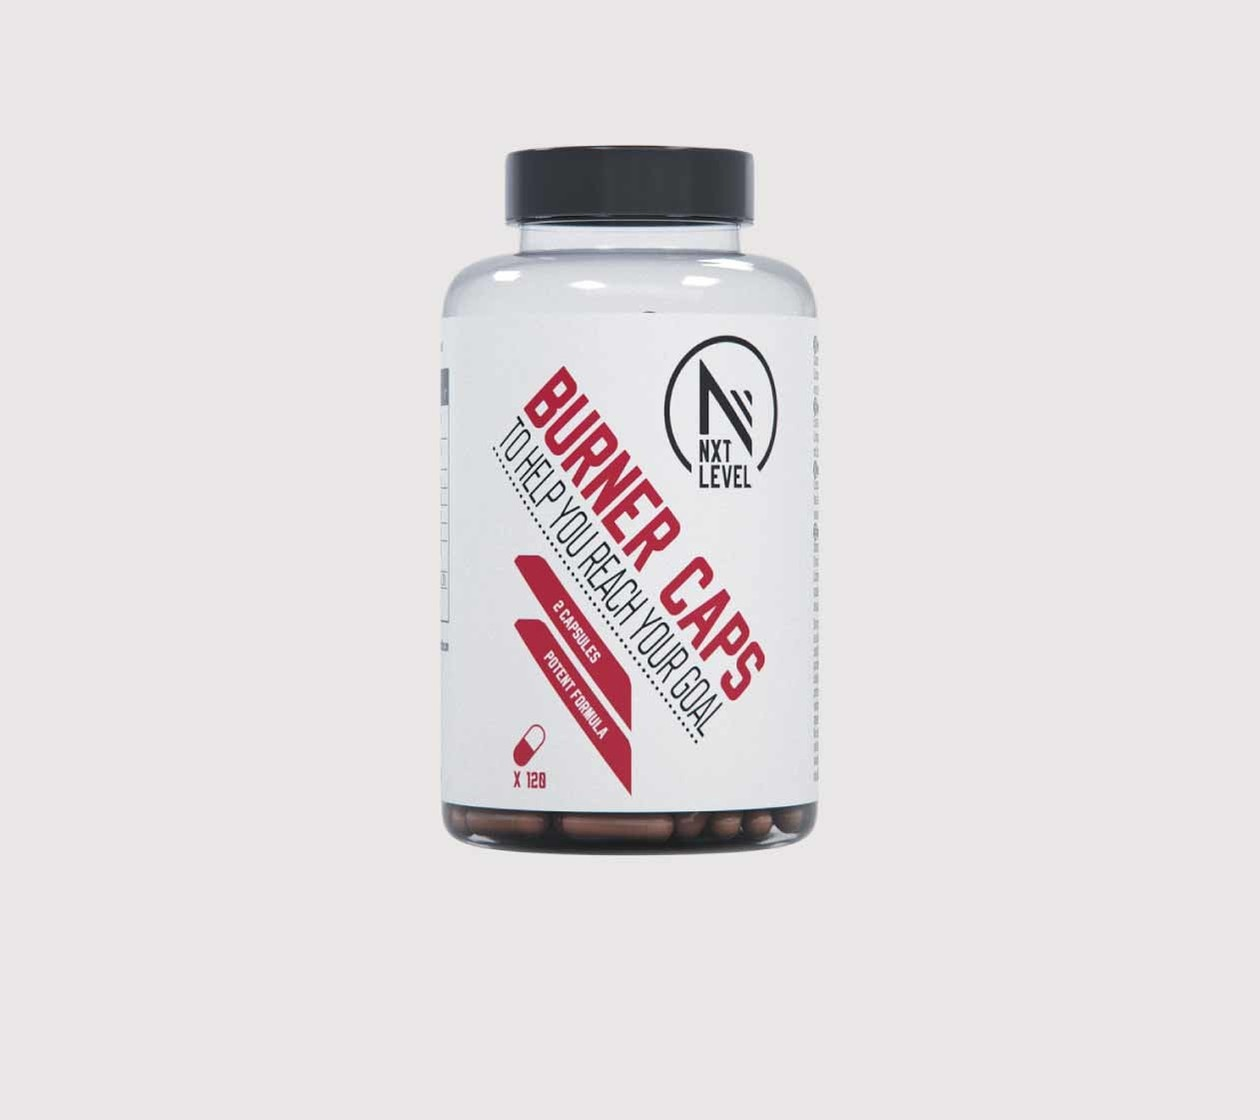 Burner Caps - 120 capsules - 2 per dag